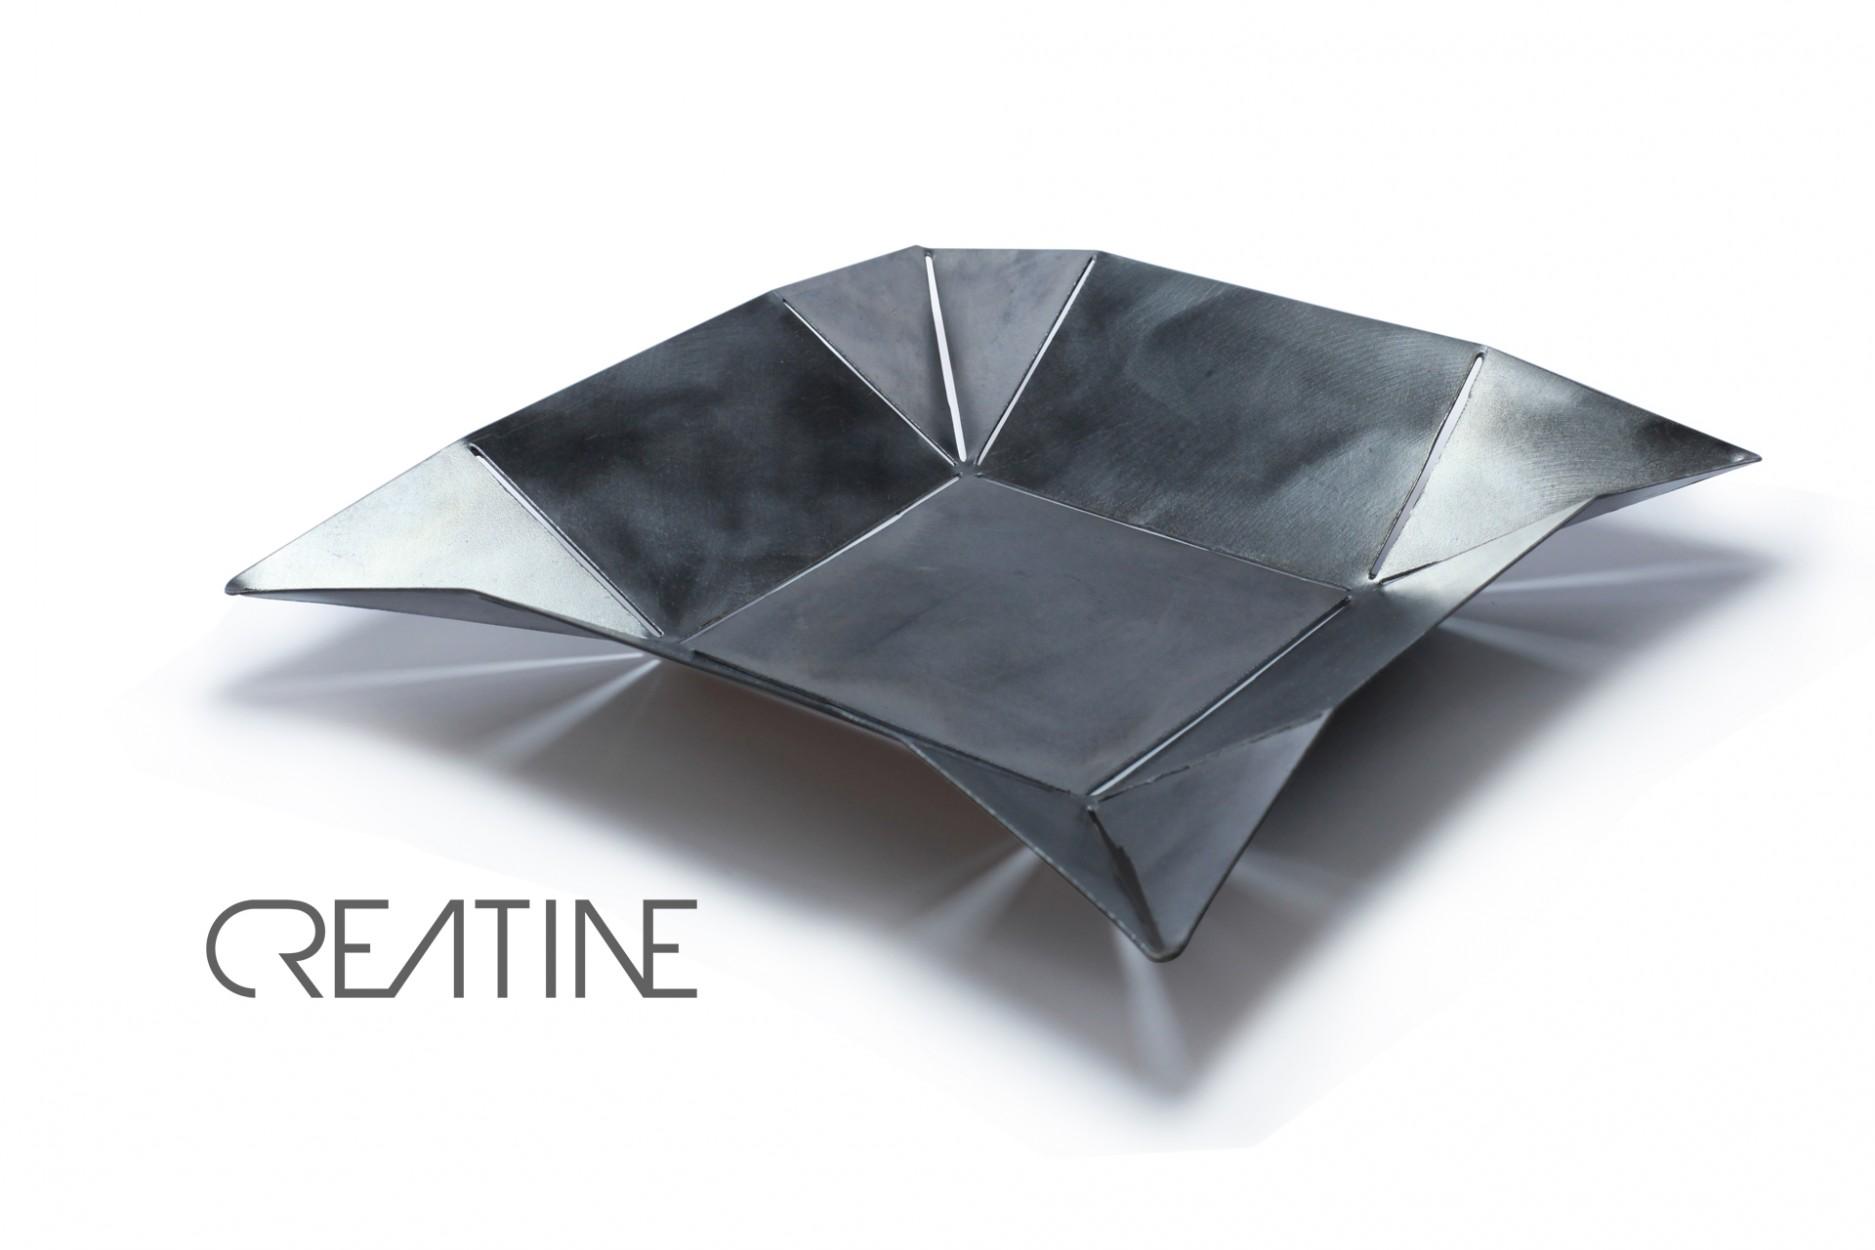 photographie paca-publicitaire-packshot-coupelle-CREATINE-design-1920-x-1280